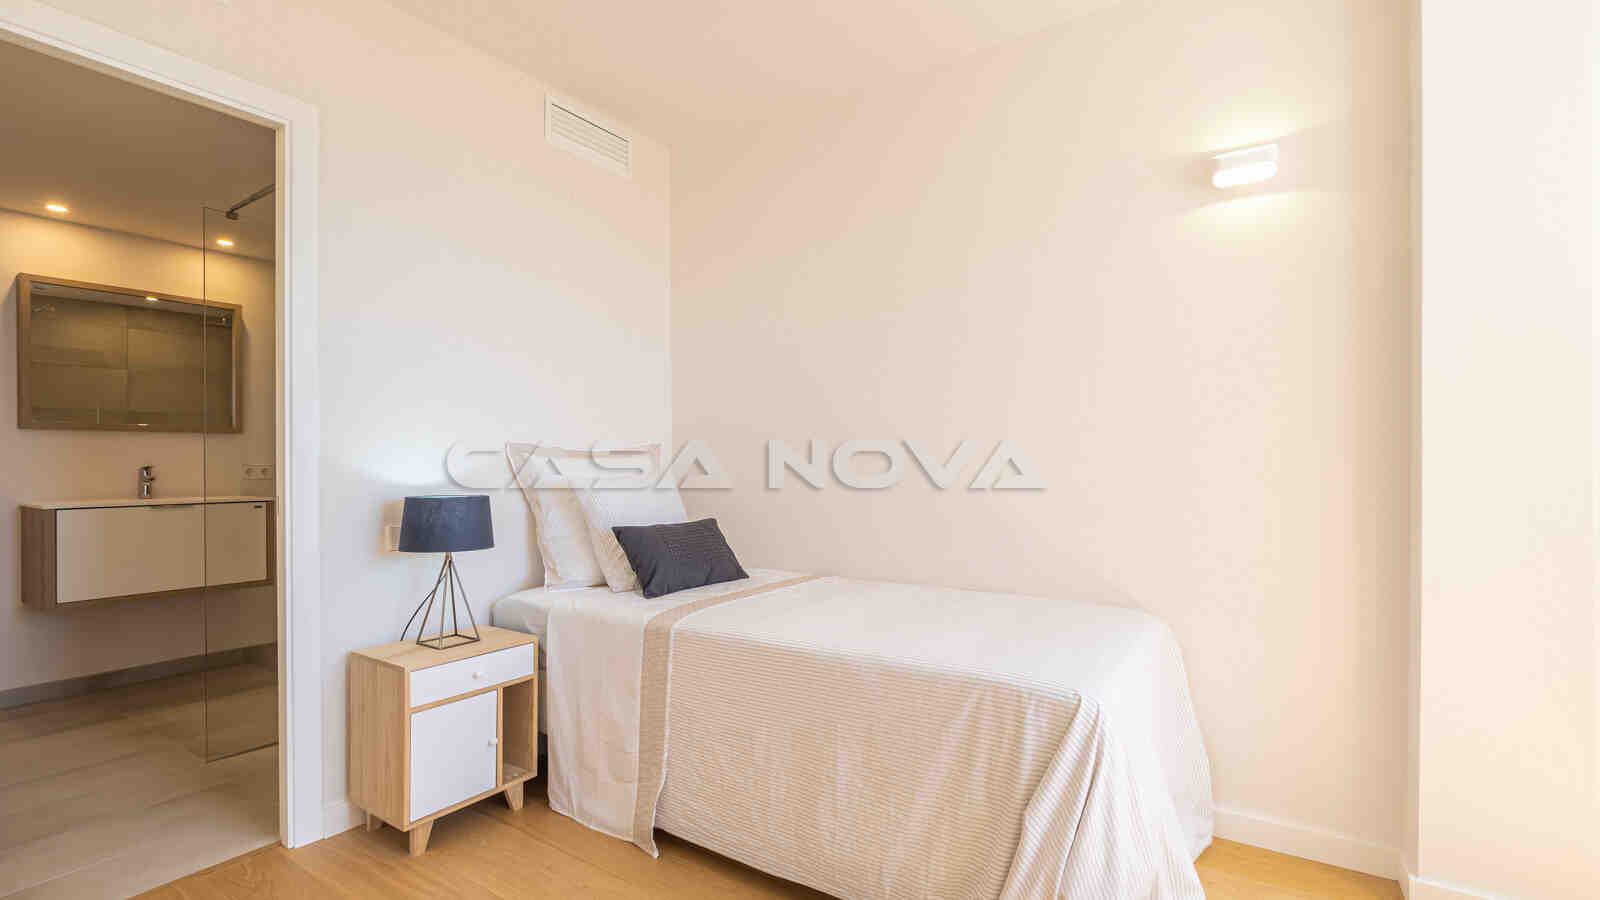 Ref. 1303017 - Drittes Schlafzimmer mit modernem Bad en Suite